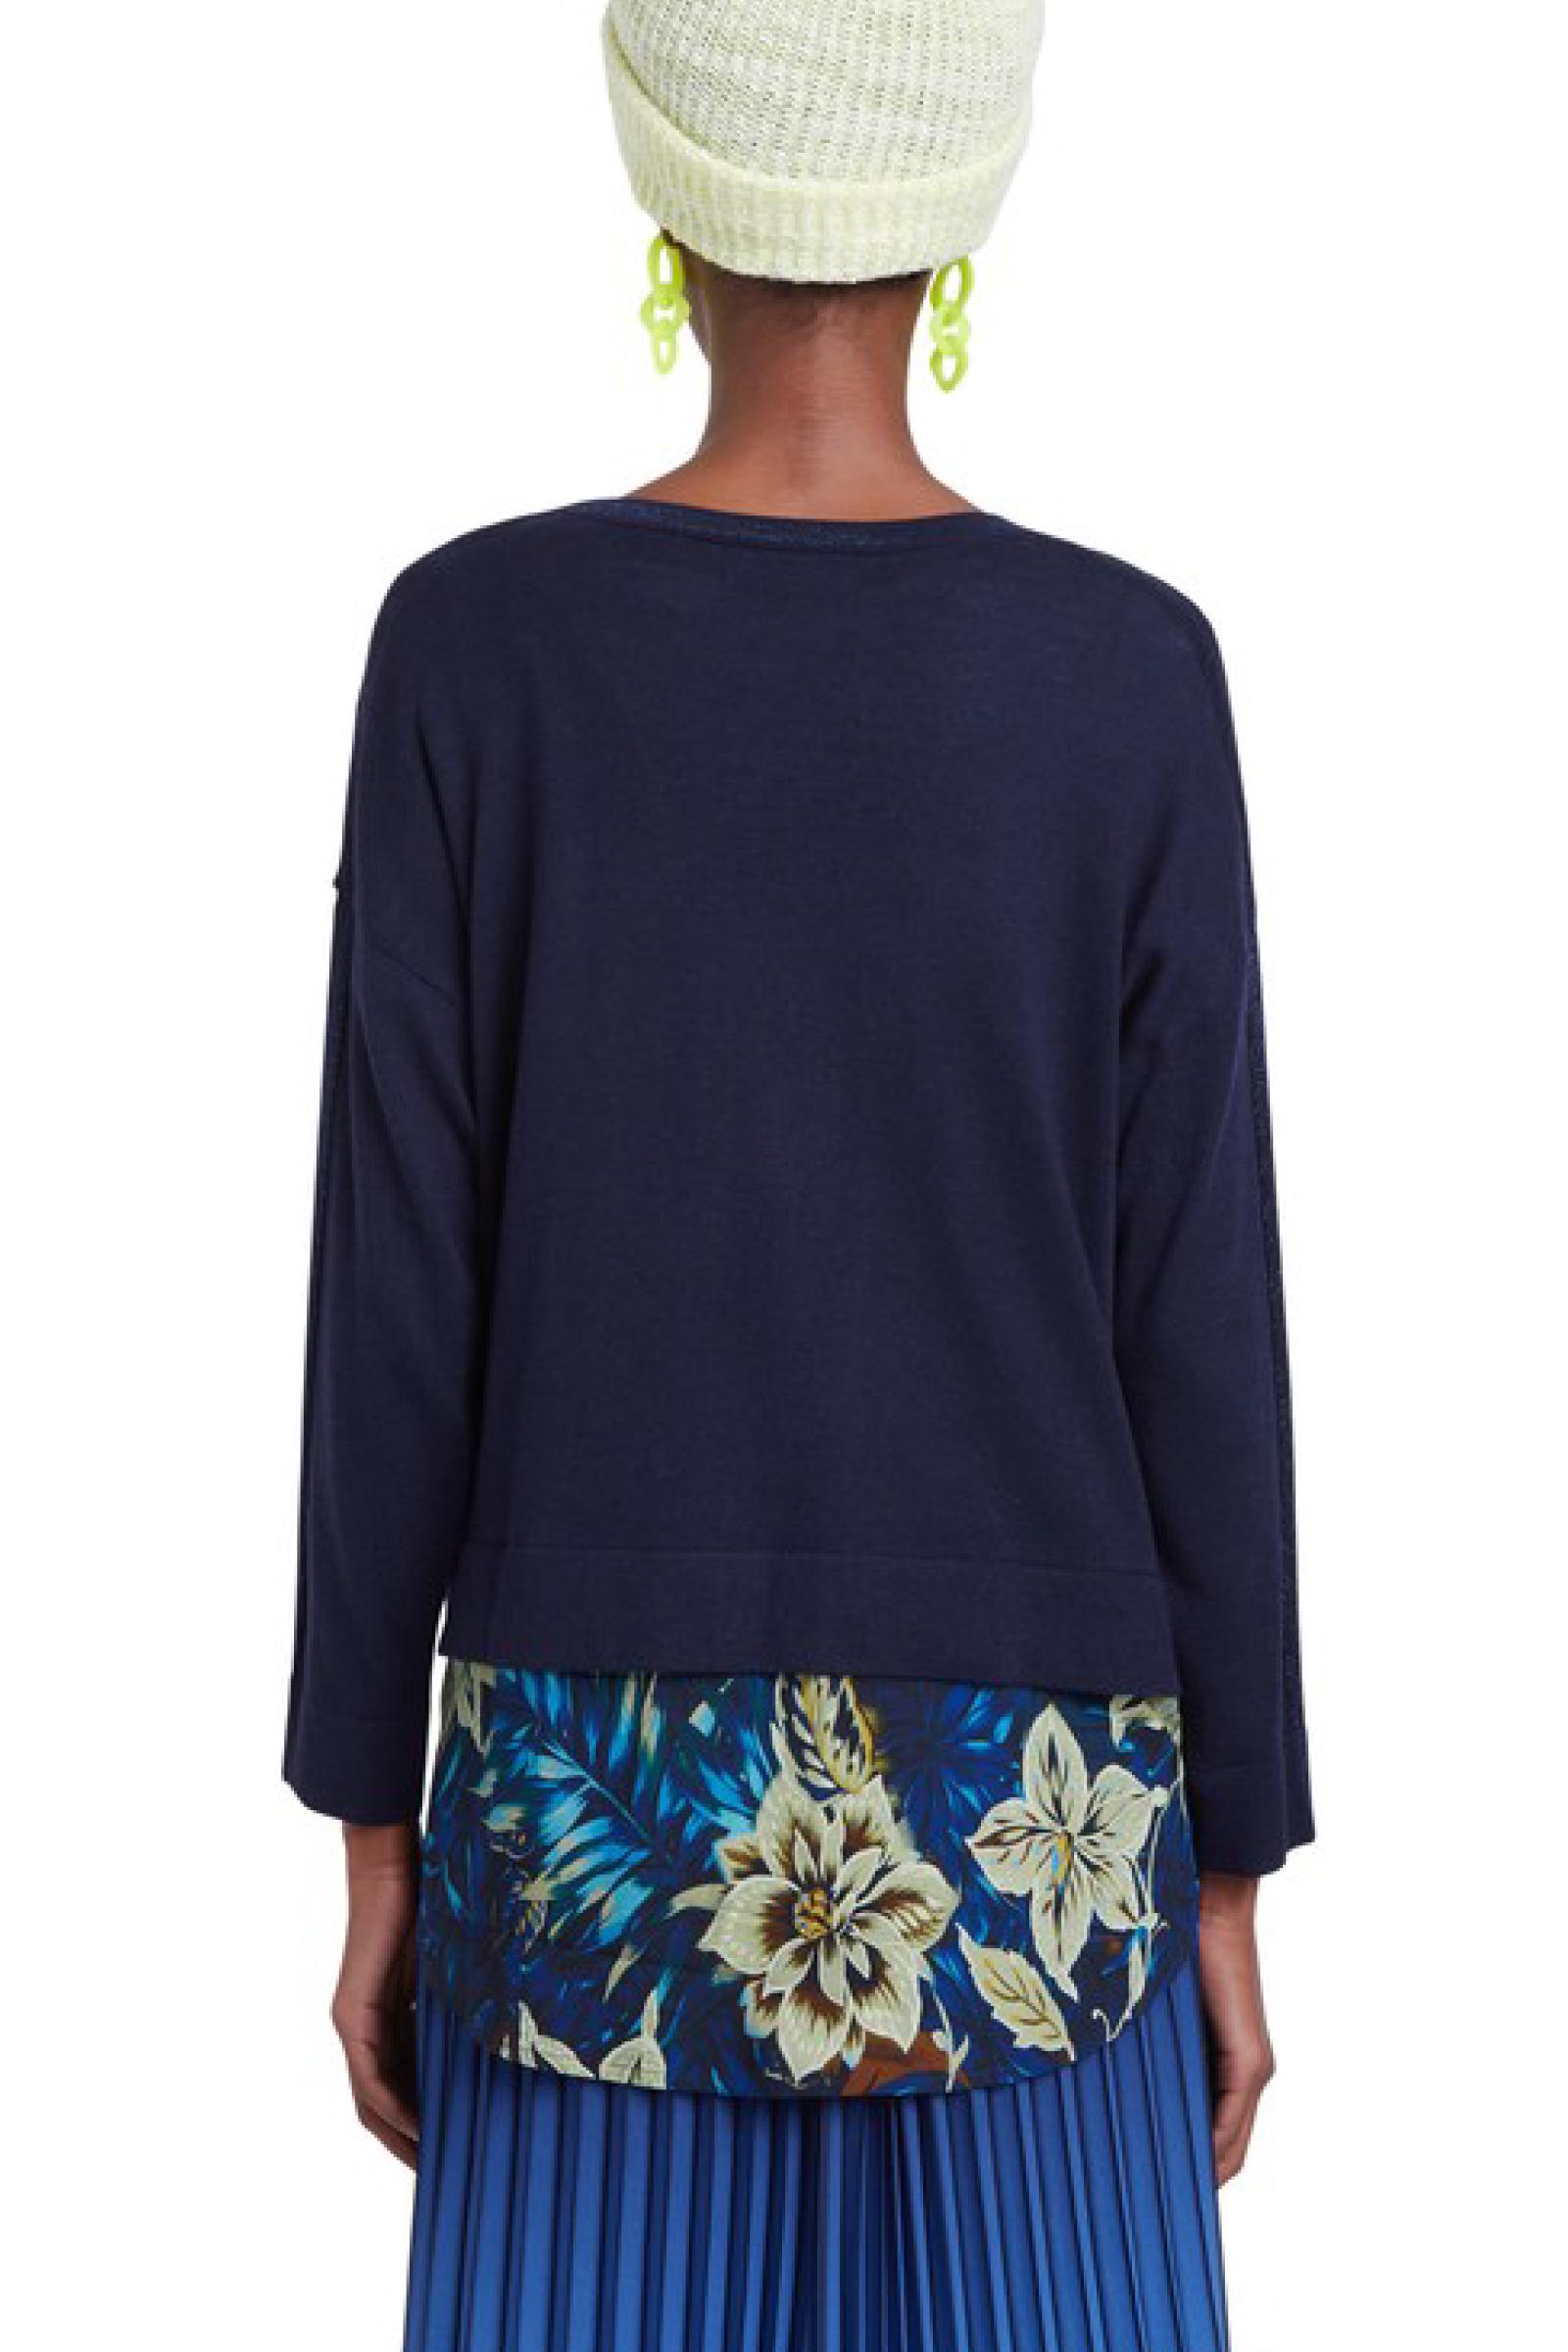 DESIGUAL Pullover Woman Model LUCERNA DESIGUAL |  | 20WWJF845000